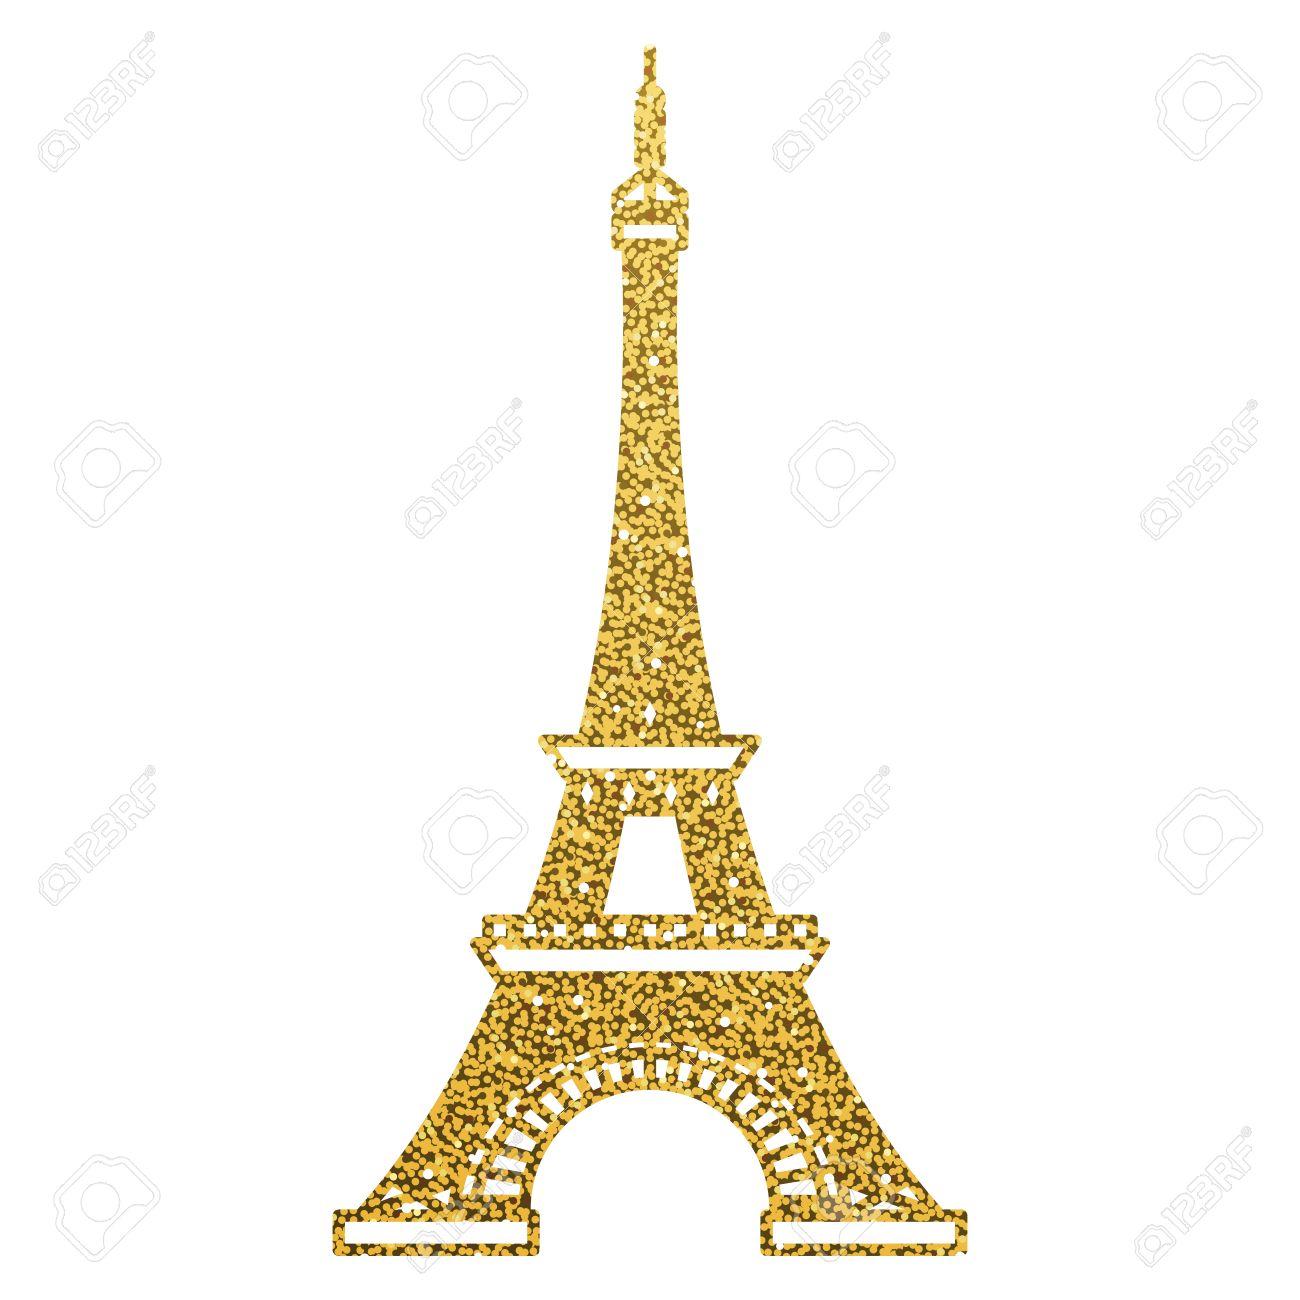 Gold Eiffel Tower Clipart.